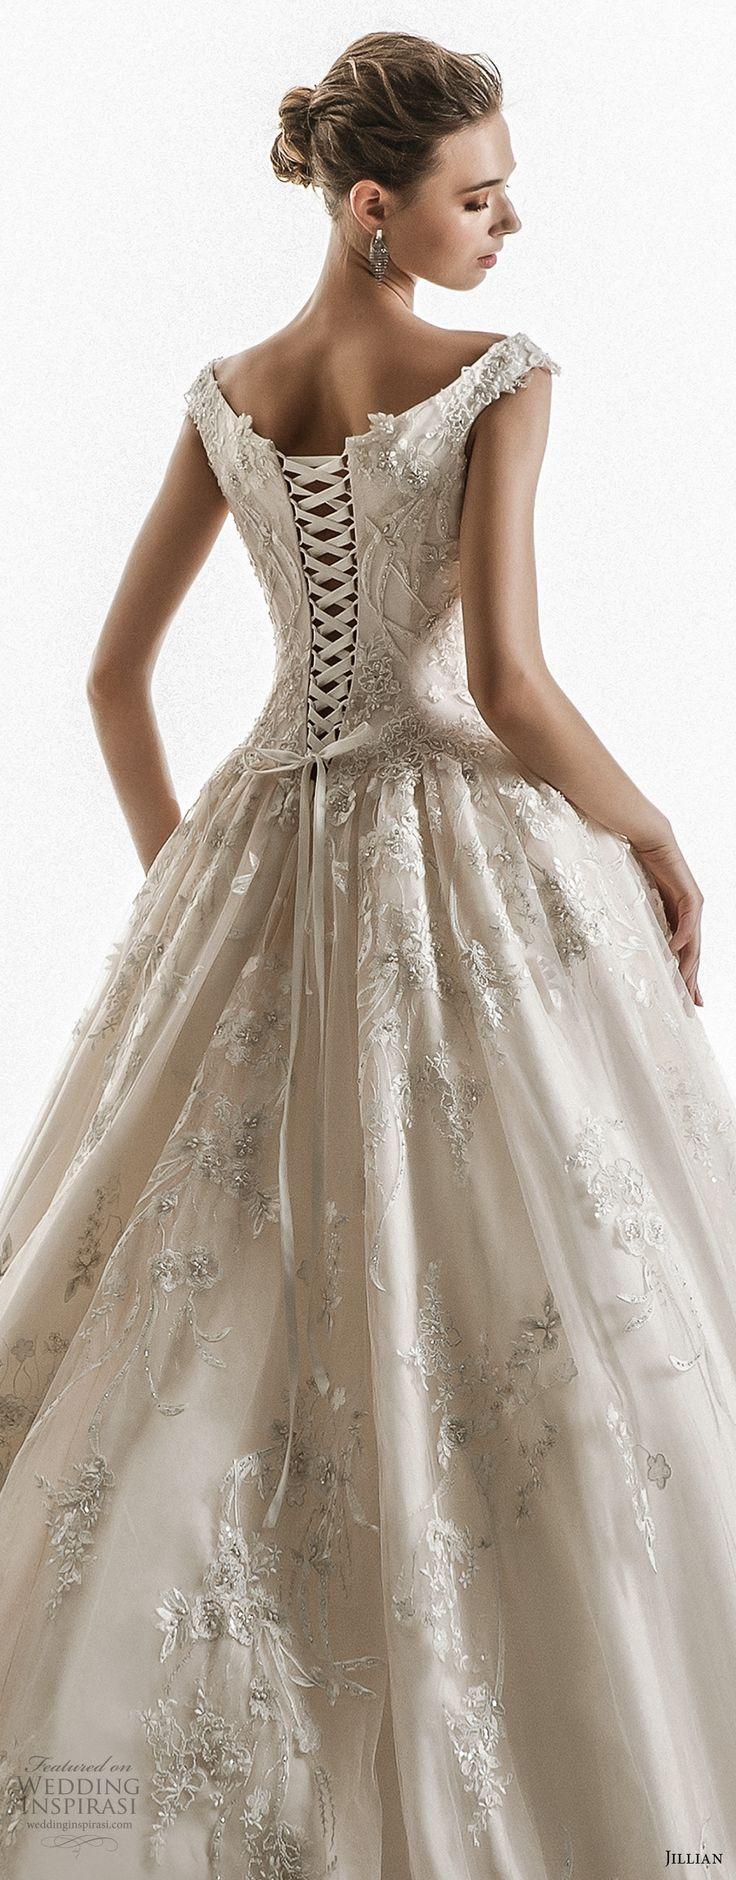 jillian 2018 bridal off the shoulder cap sleeves sweetheart neckline ...